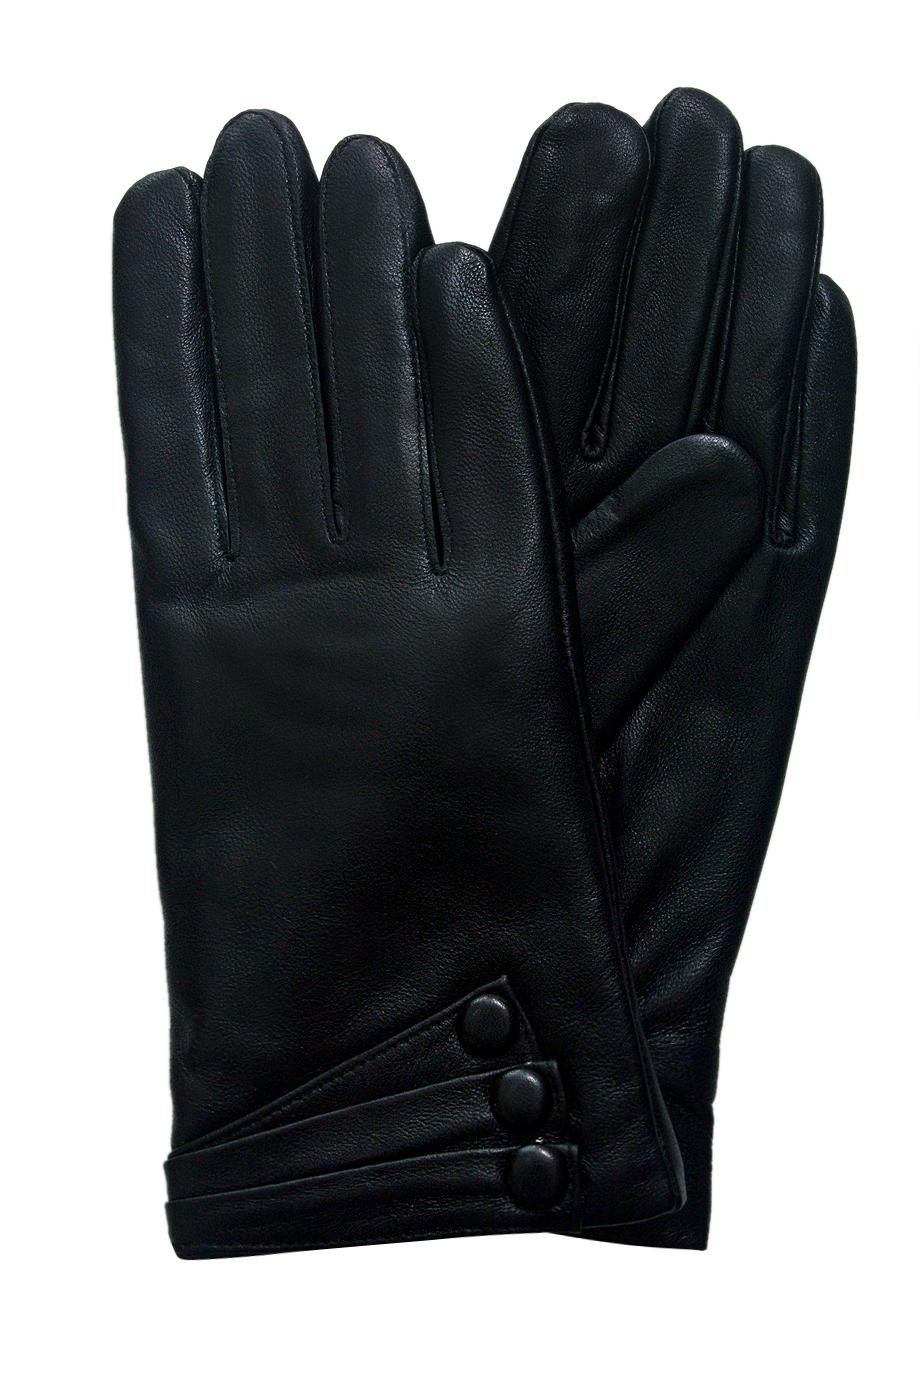 Găng tay nữ ELMI da dê cao cấp EGW133